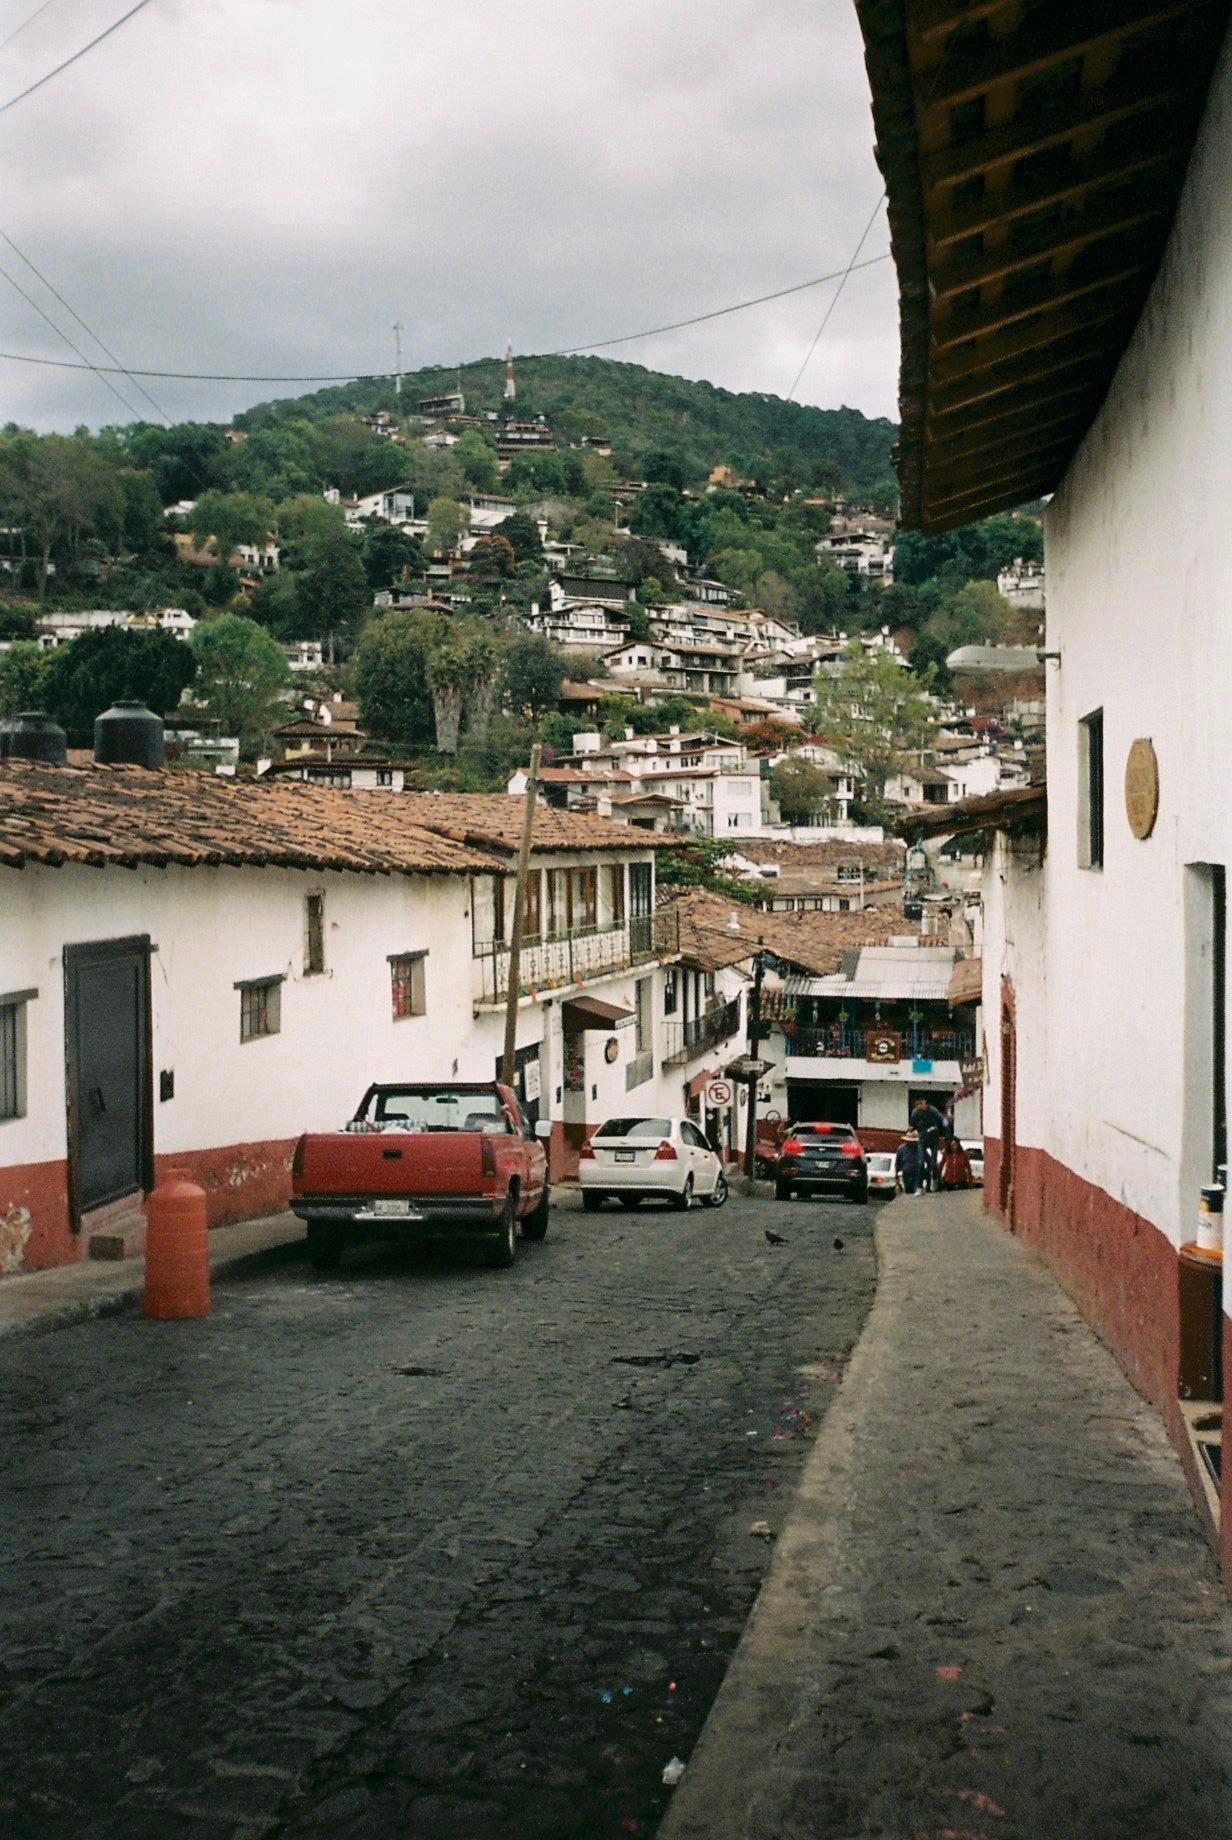 Valle De Bravo 01-2020 - 29 of 51